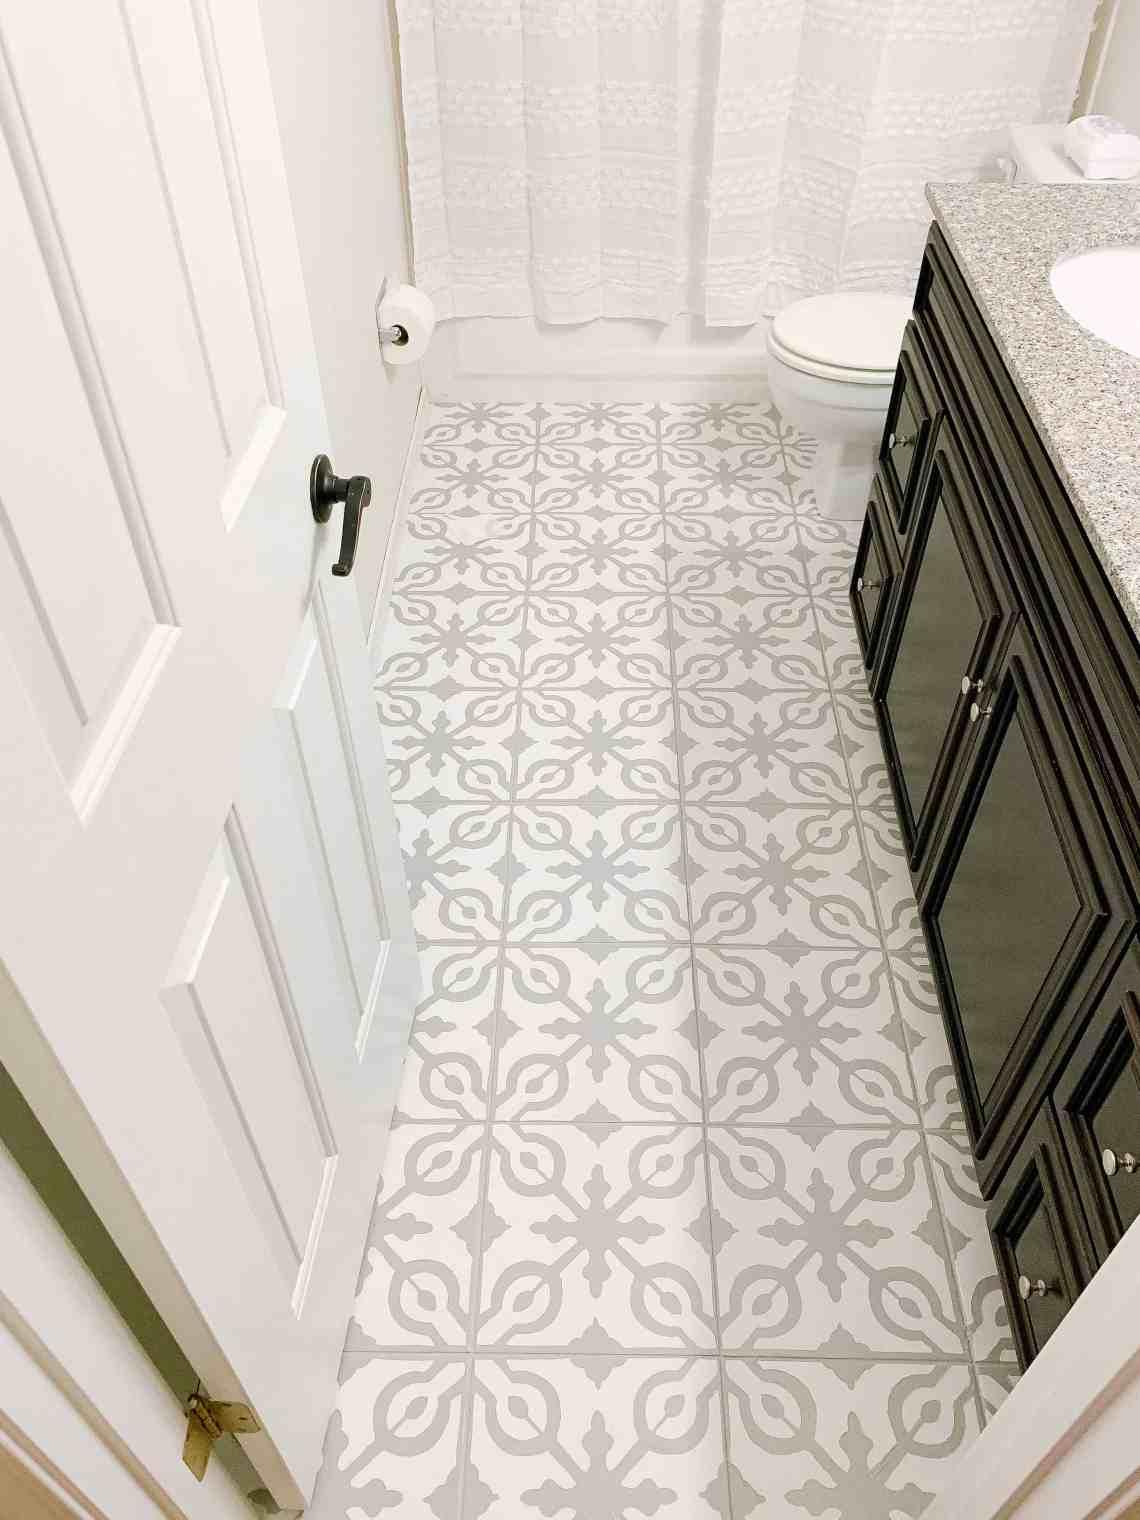 How To Paint Tile Floors Arinsolangeathome